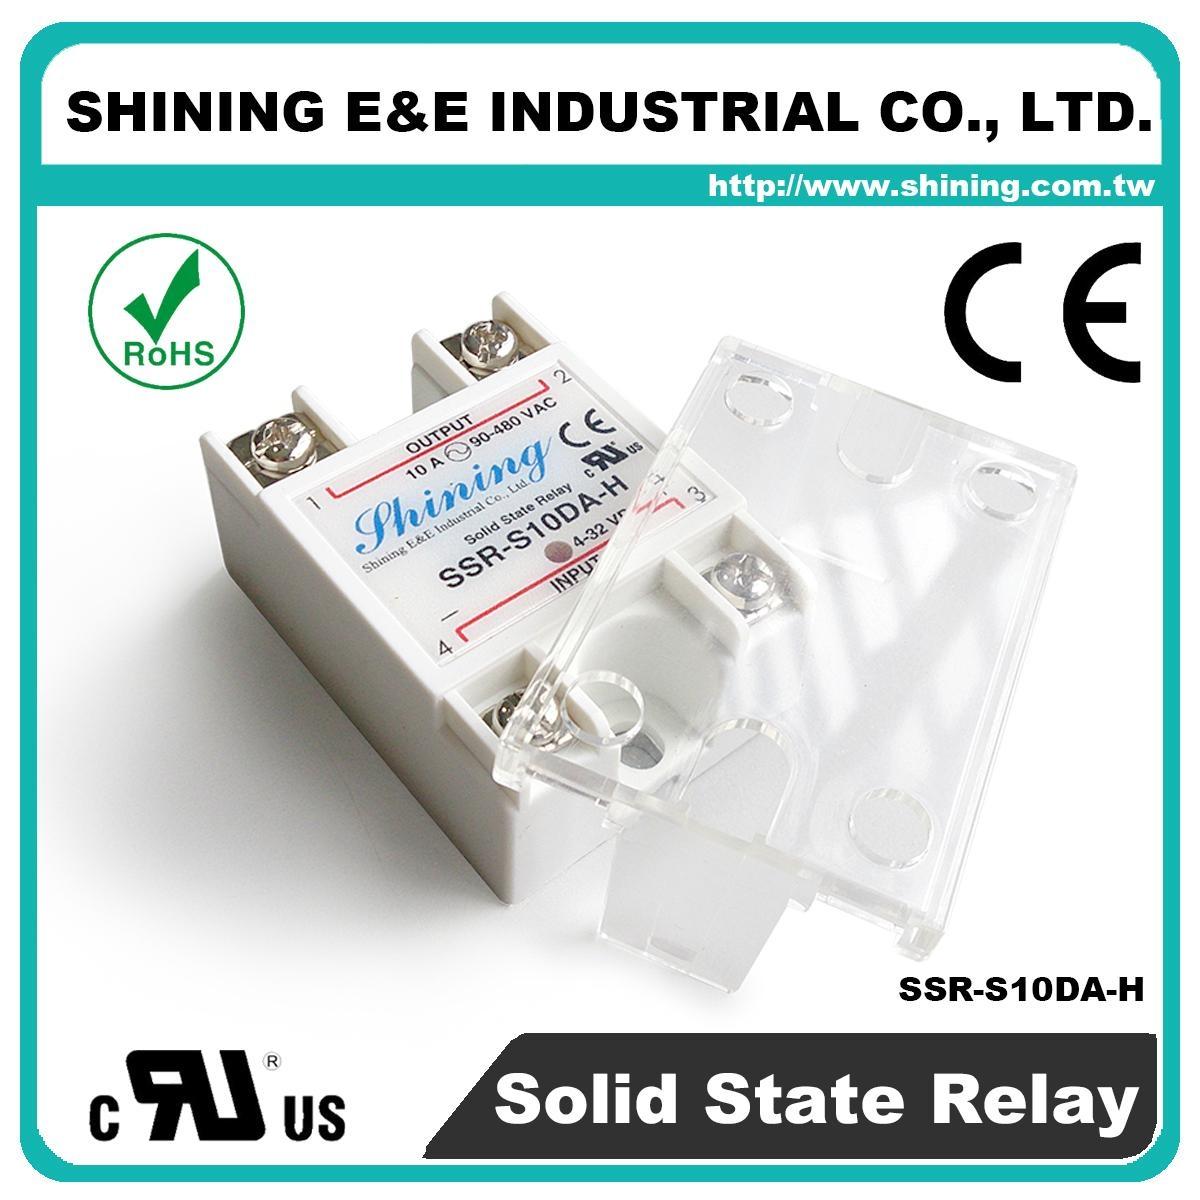 SSR-S10DA-H DC to AC 單相固態繼電器 Solid State Relay 4